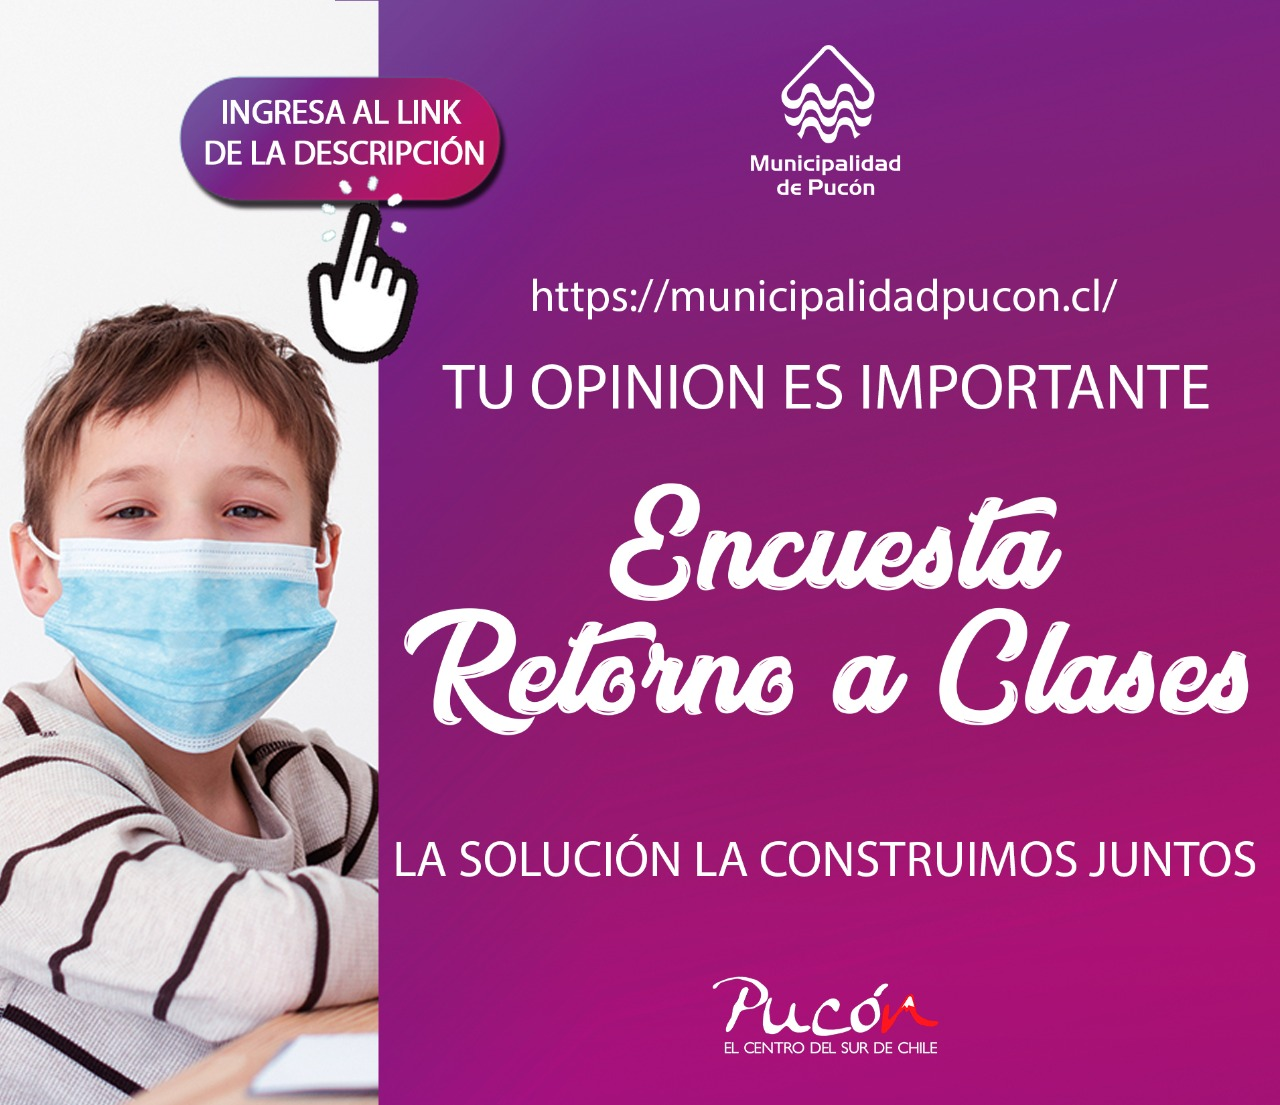 Primera encuesta municipal online: ¿Estás a favor del retorno a clases presencial?